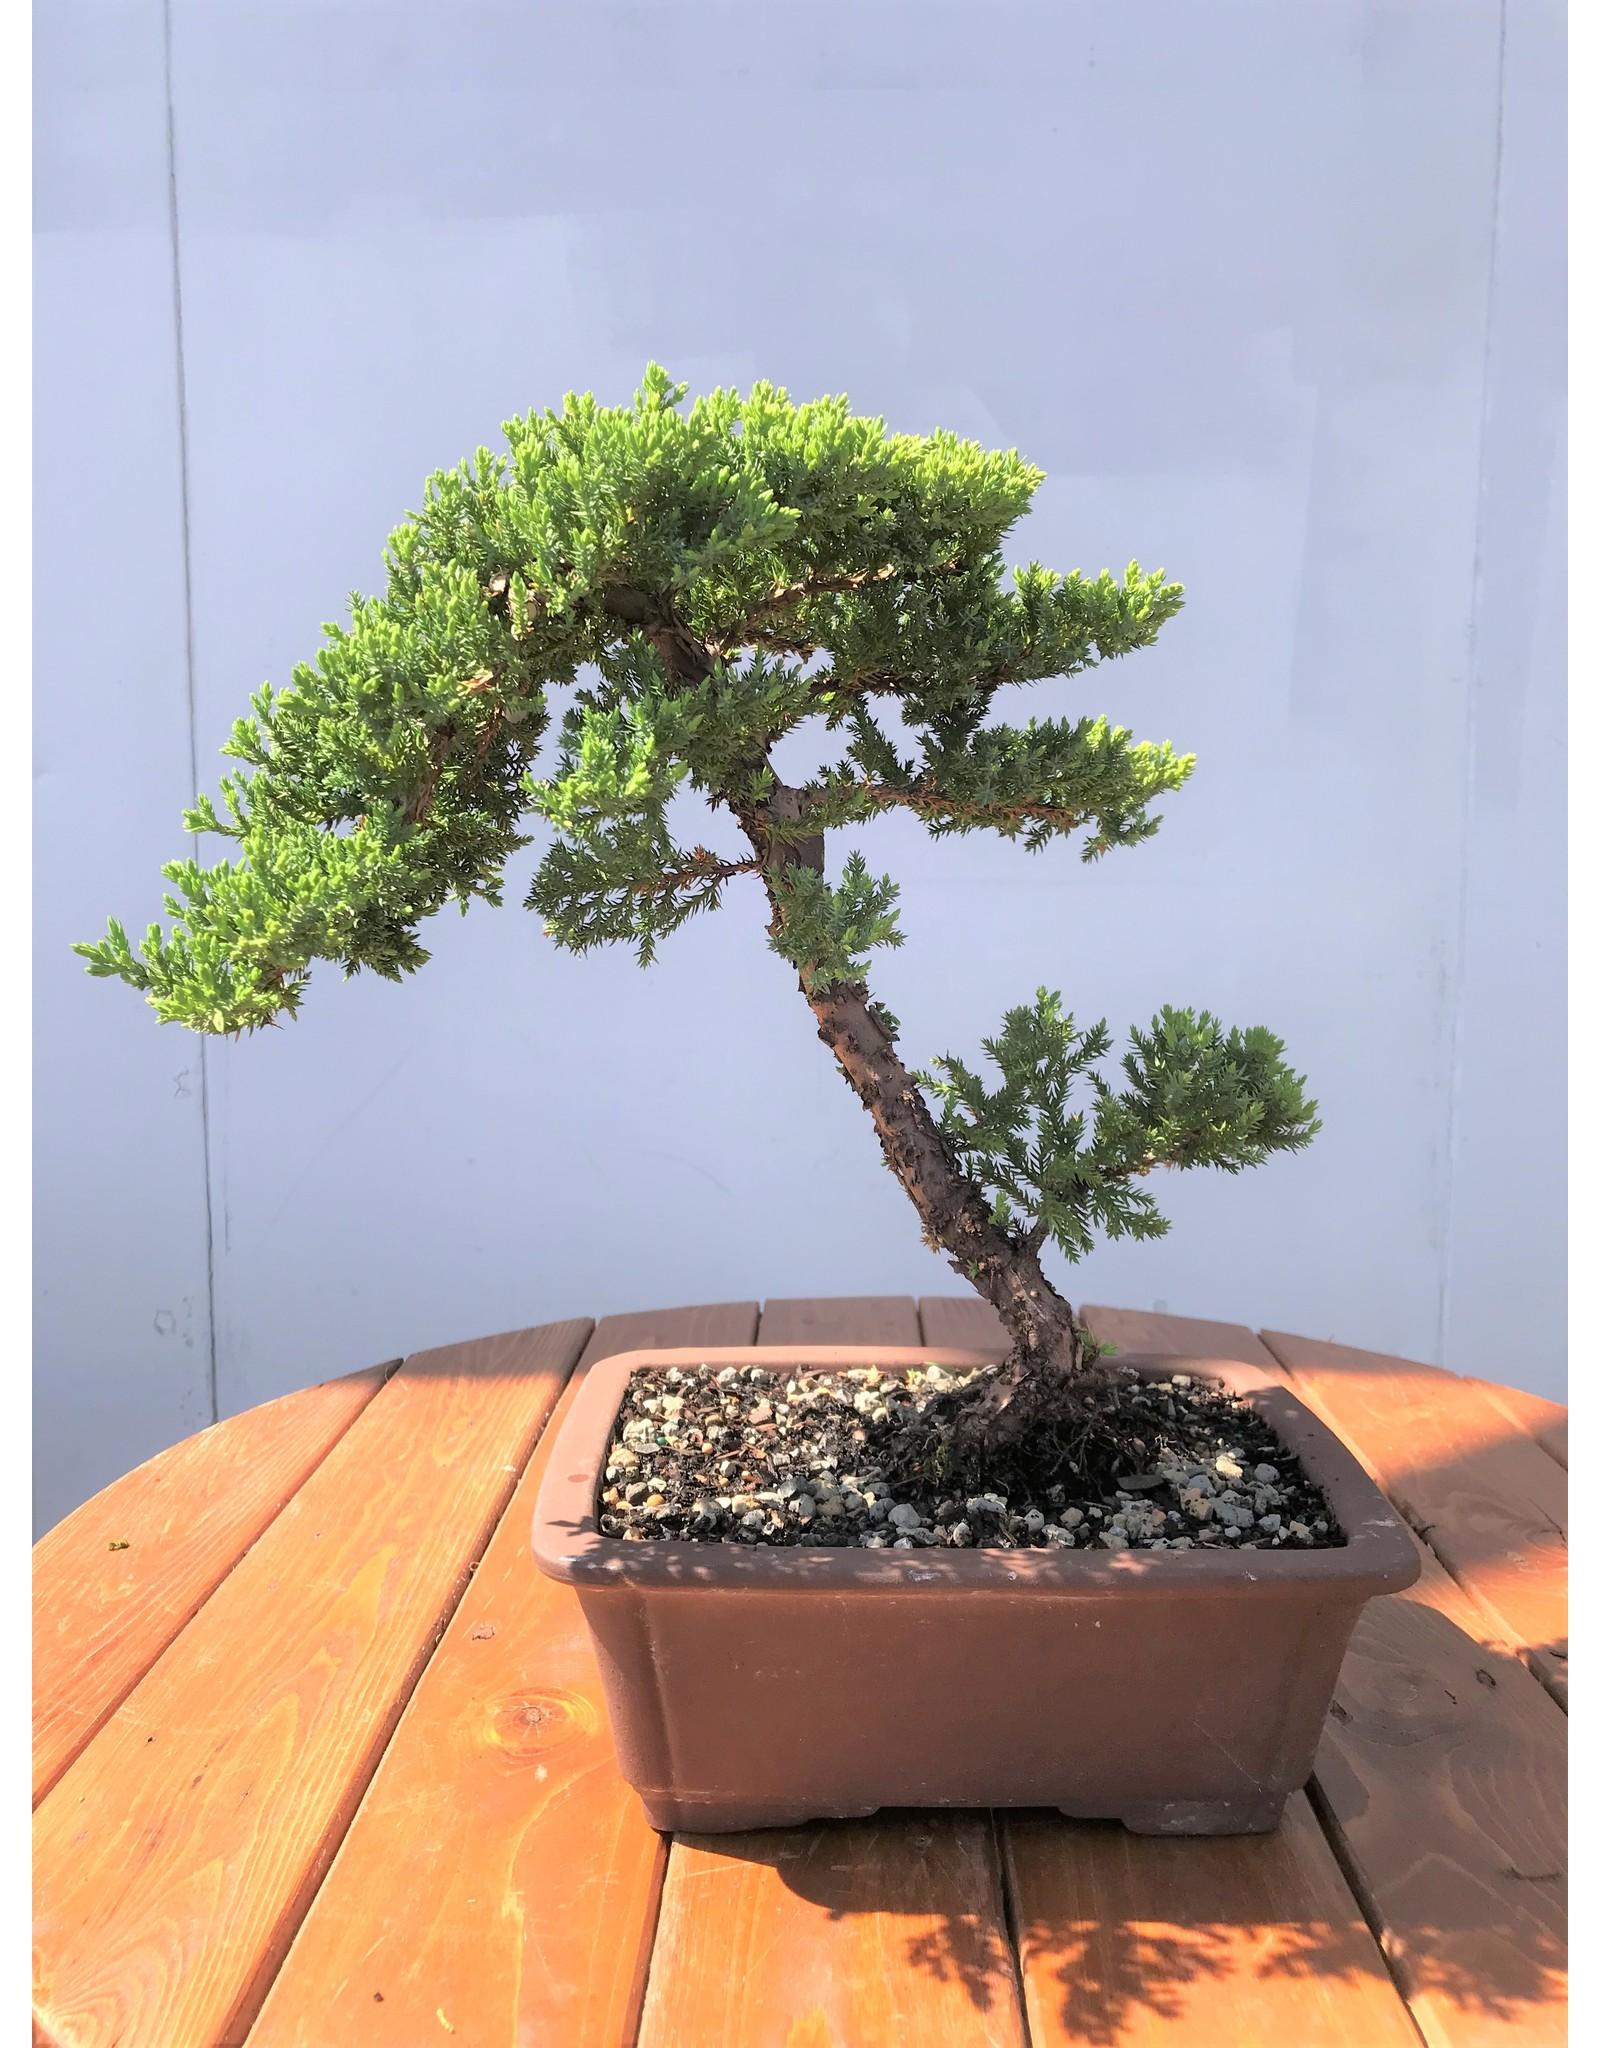 Bonsai, Juniper - Juniperus Procumbens nana 'Green Mound'